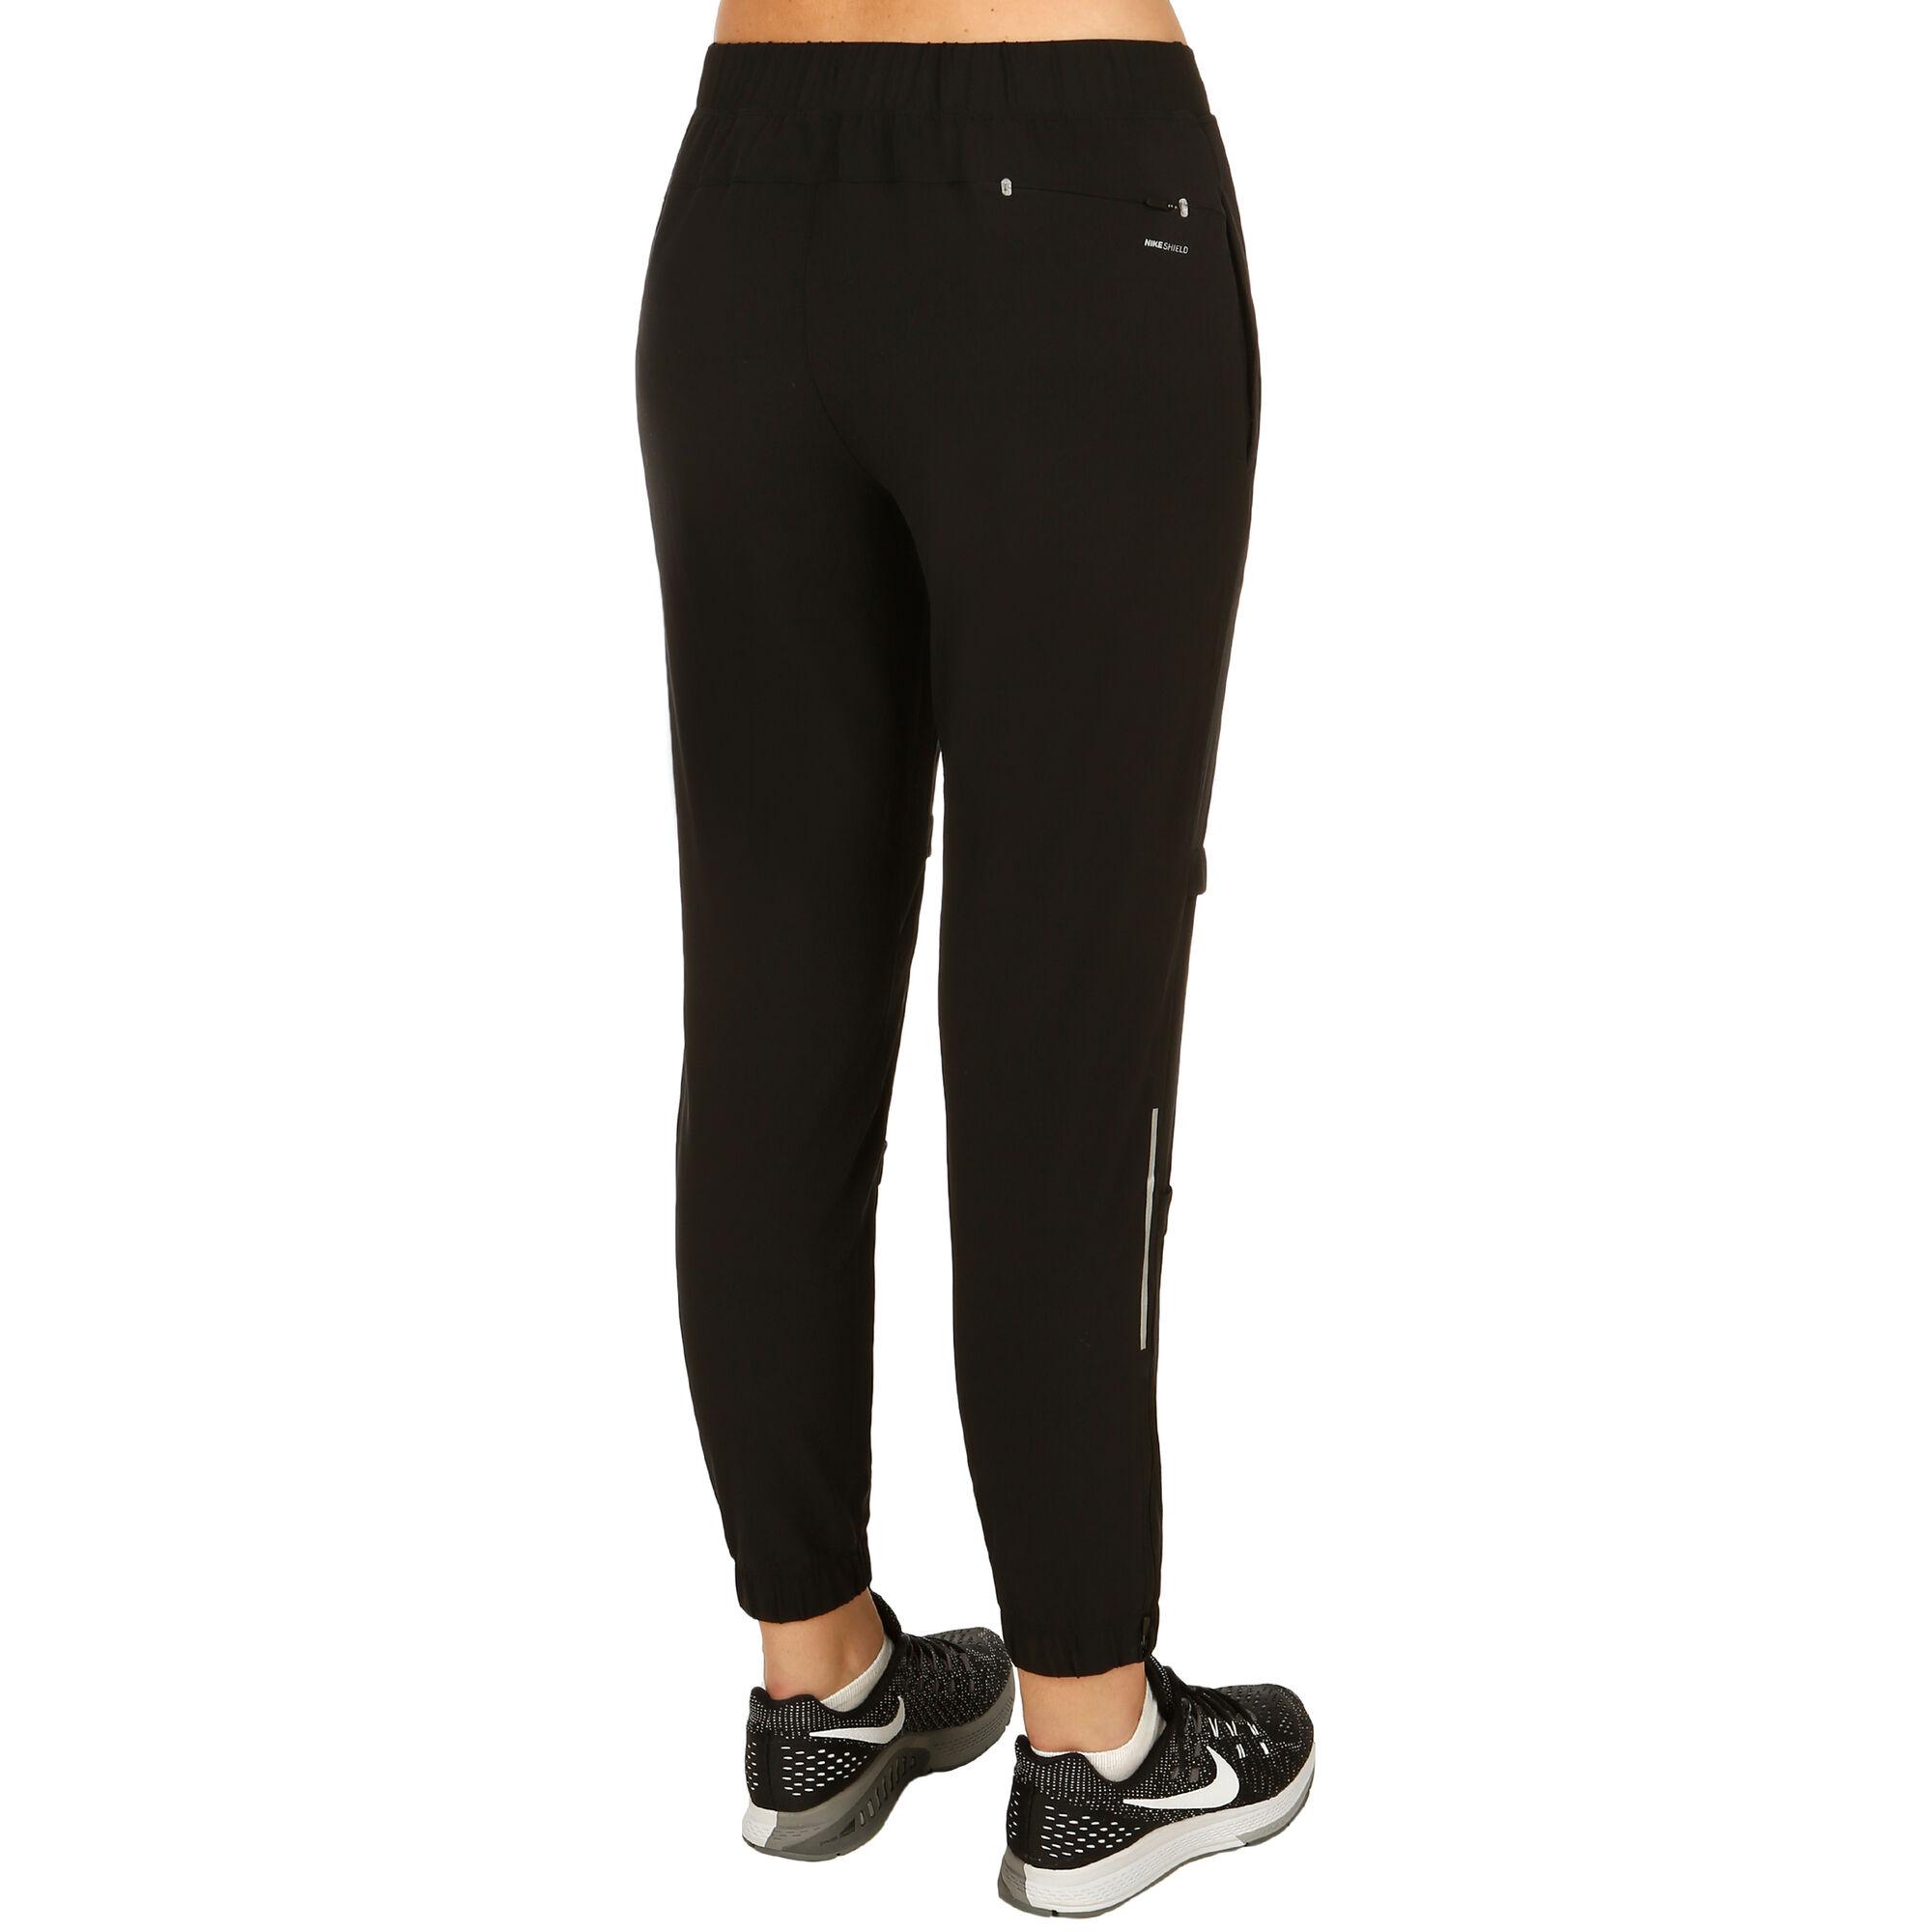 fc9c0df80b587 Nike; Nike; Nike; Nike; Nike; Nike; Nike; Nike; Nike; Nike. Shield Swift  Running Pants ...